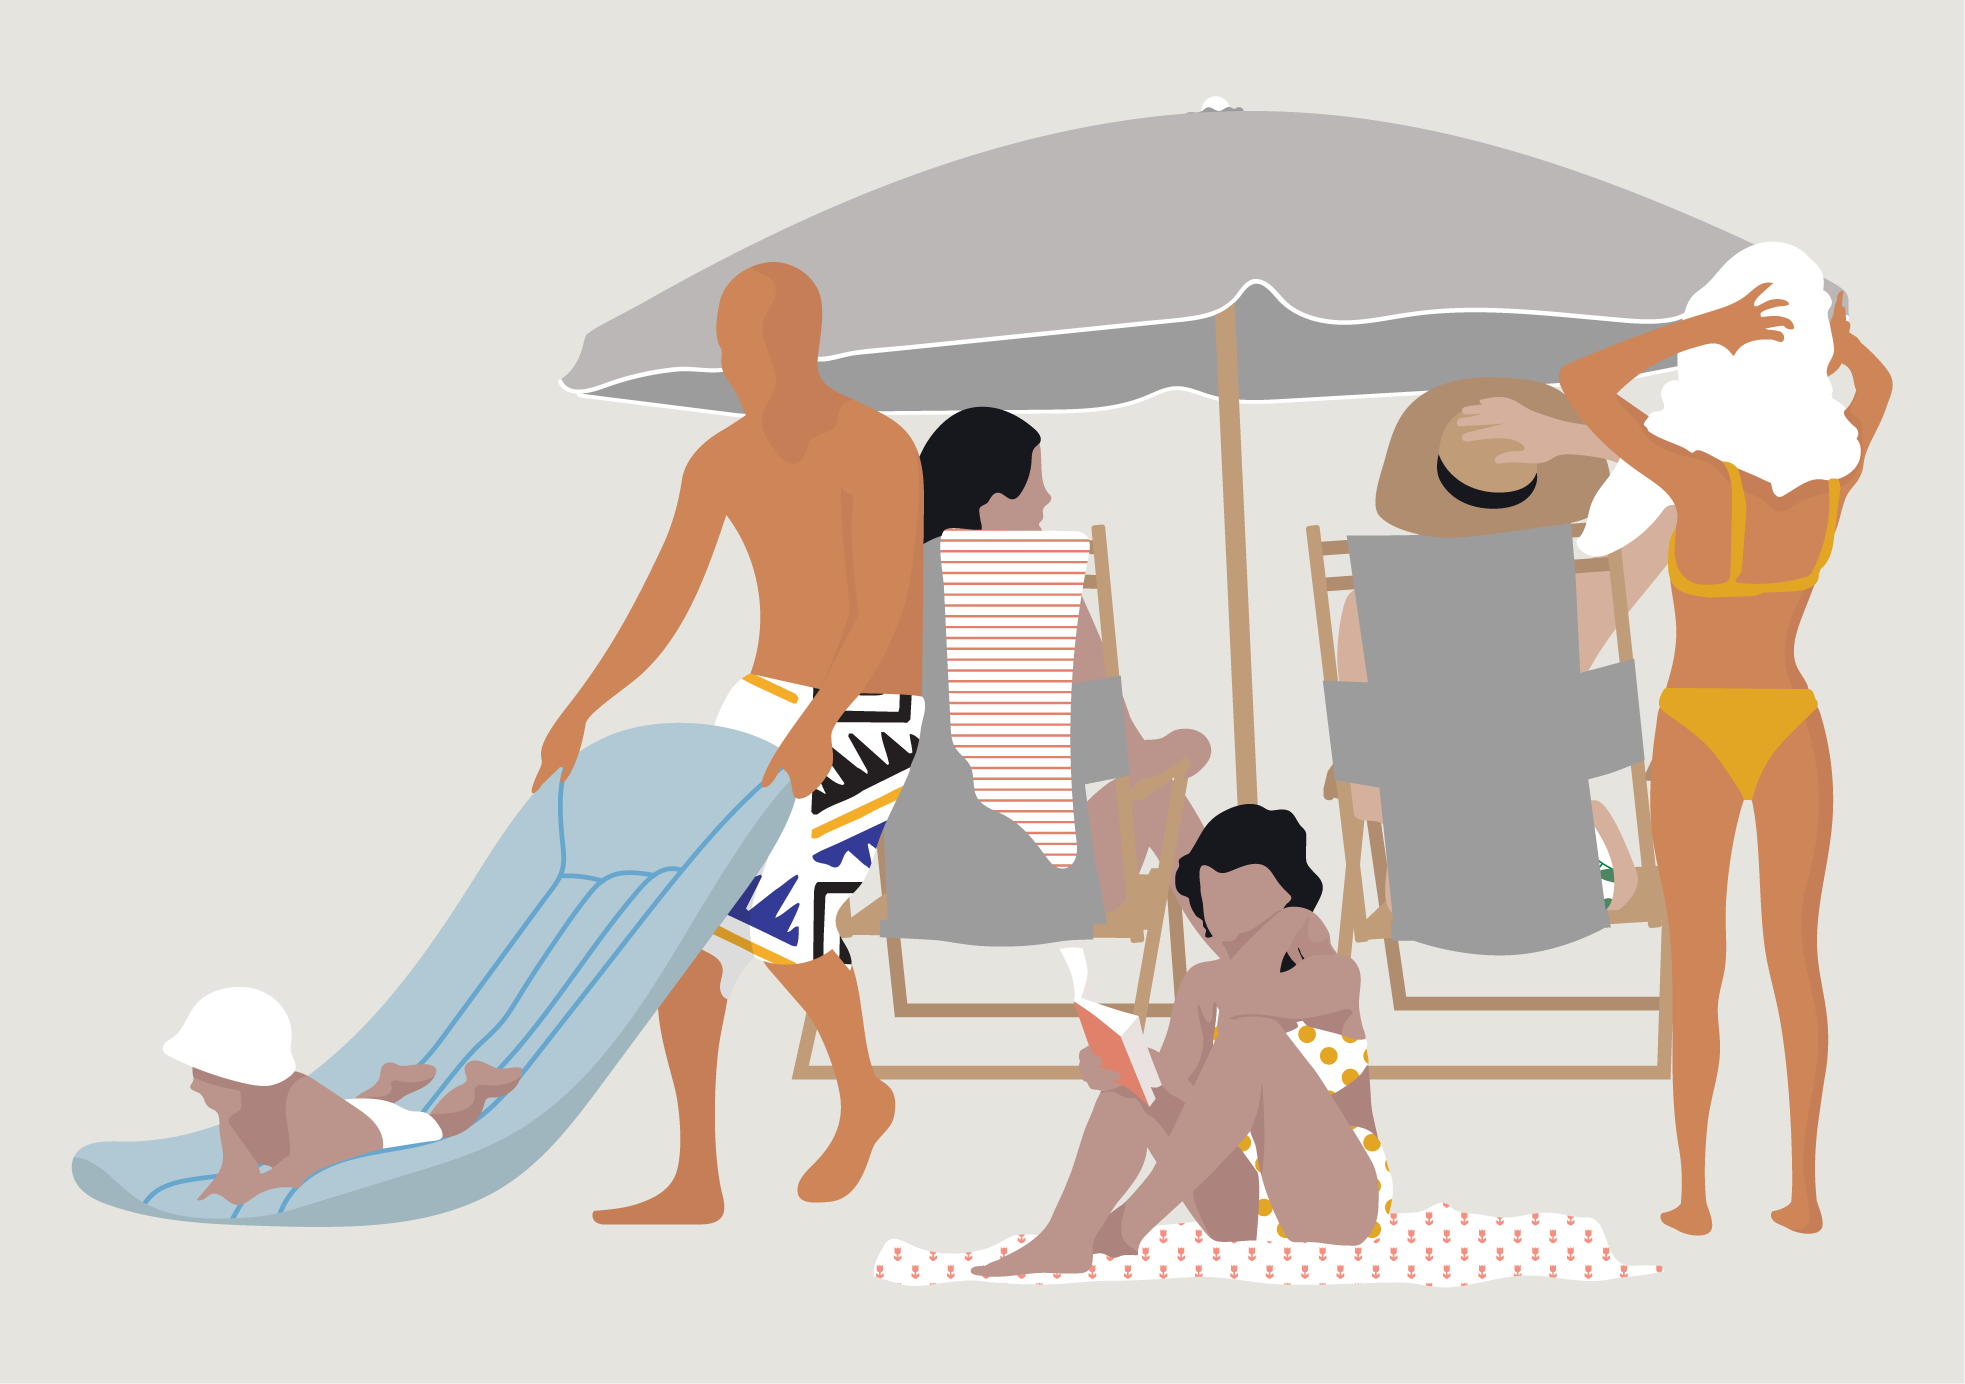 Flat Vector Beach People Illustrations For Architecture And Interior Design Ai Pdf Png People Toffu Co Architecture Desenhos Humanizacao Desenho Grafico